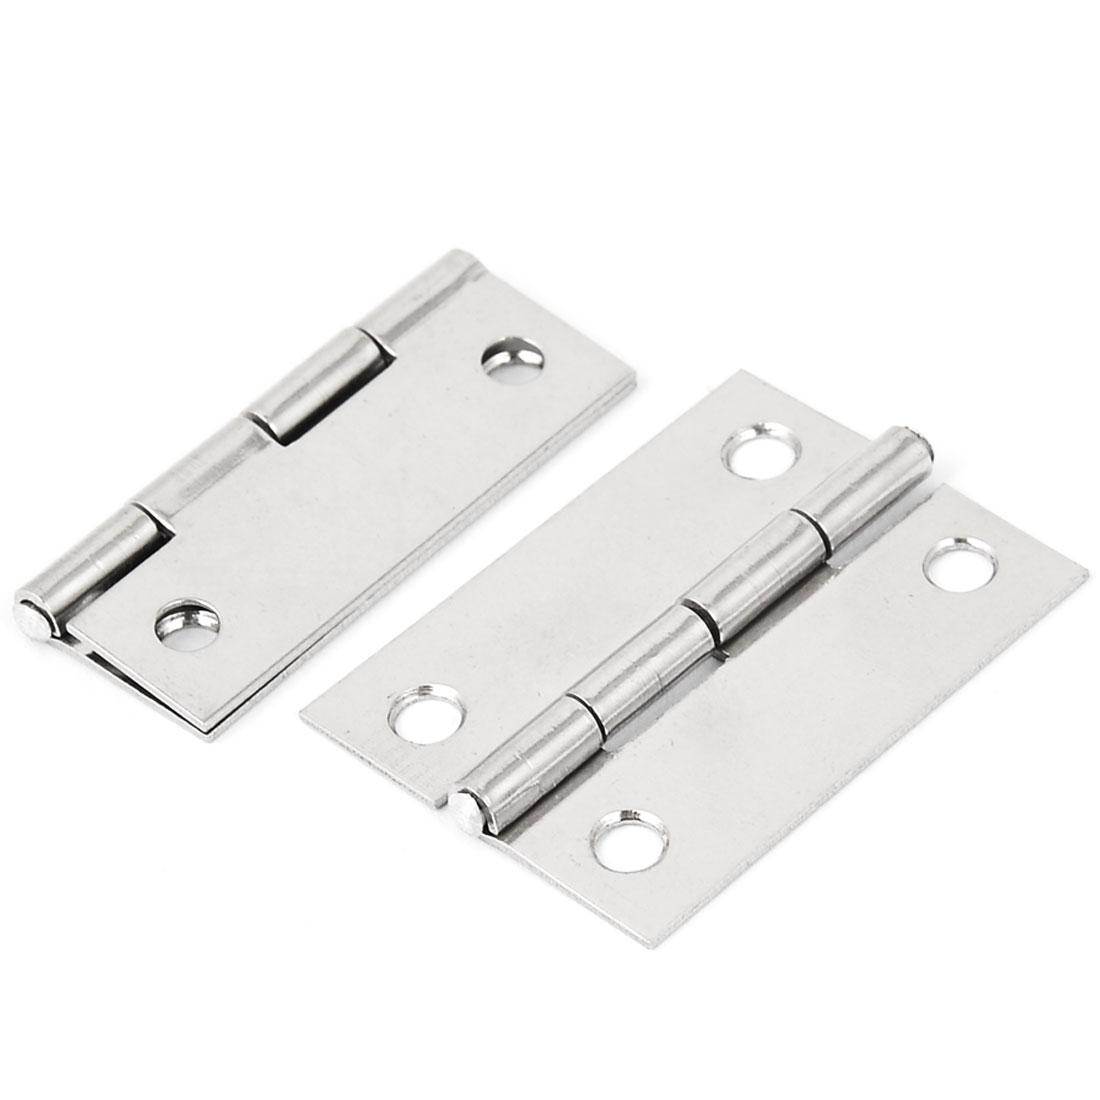 "2"" Length Stainless Steel Rectangular Folding Closet Cabinet Door Butt Hinge 2pcs"